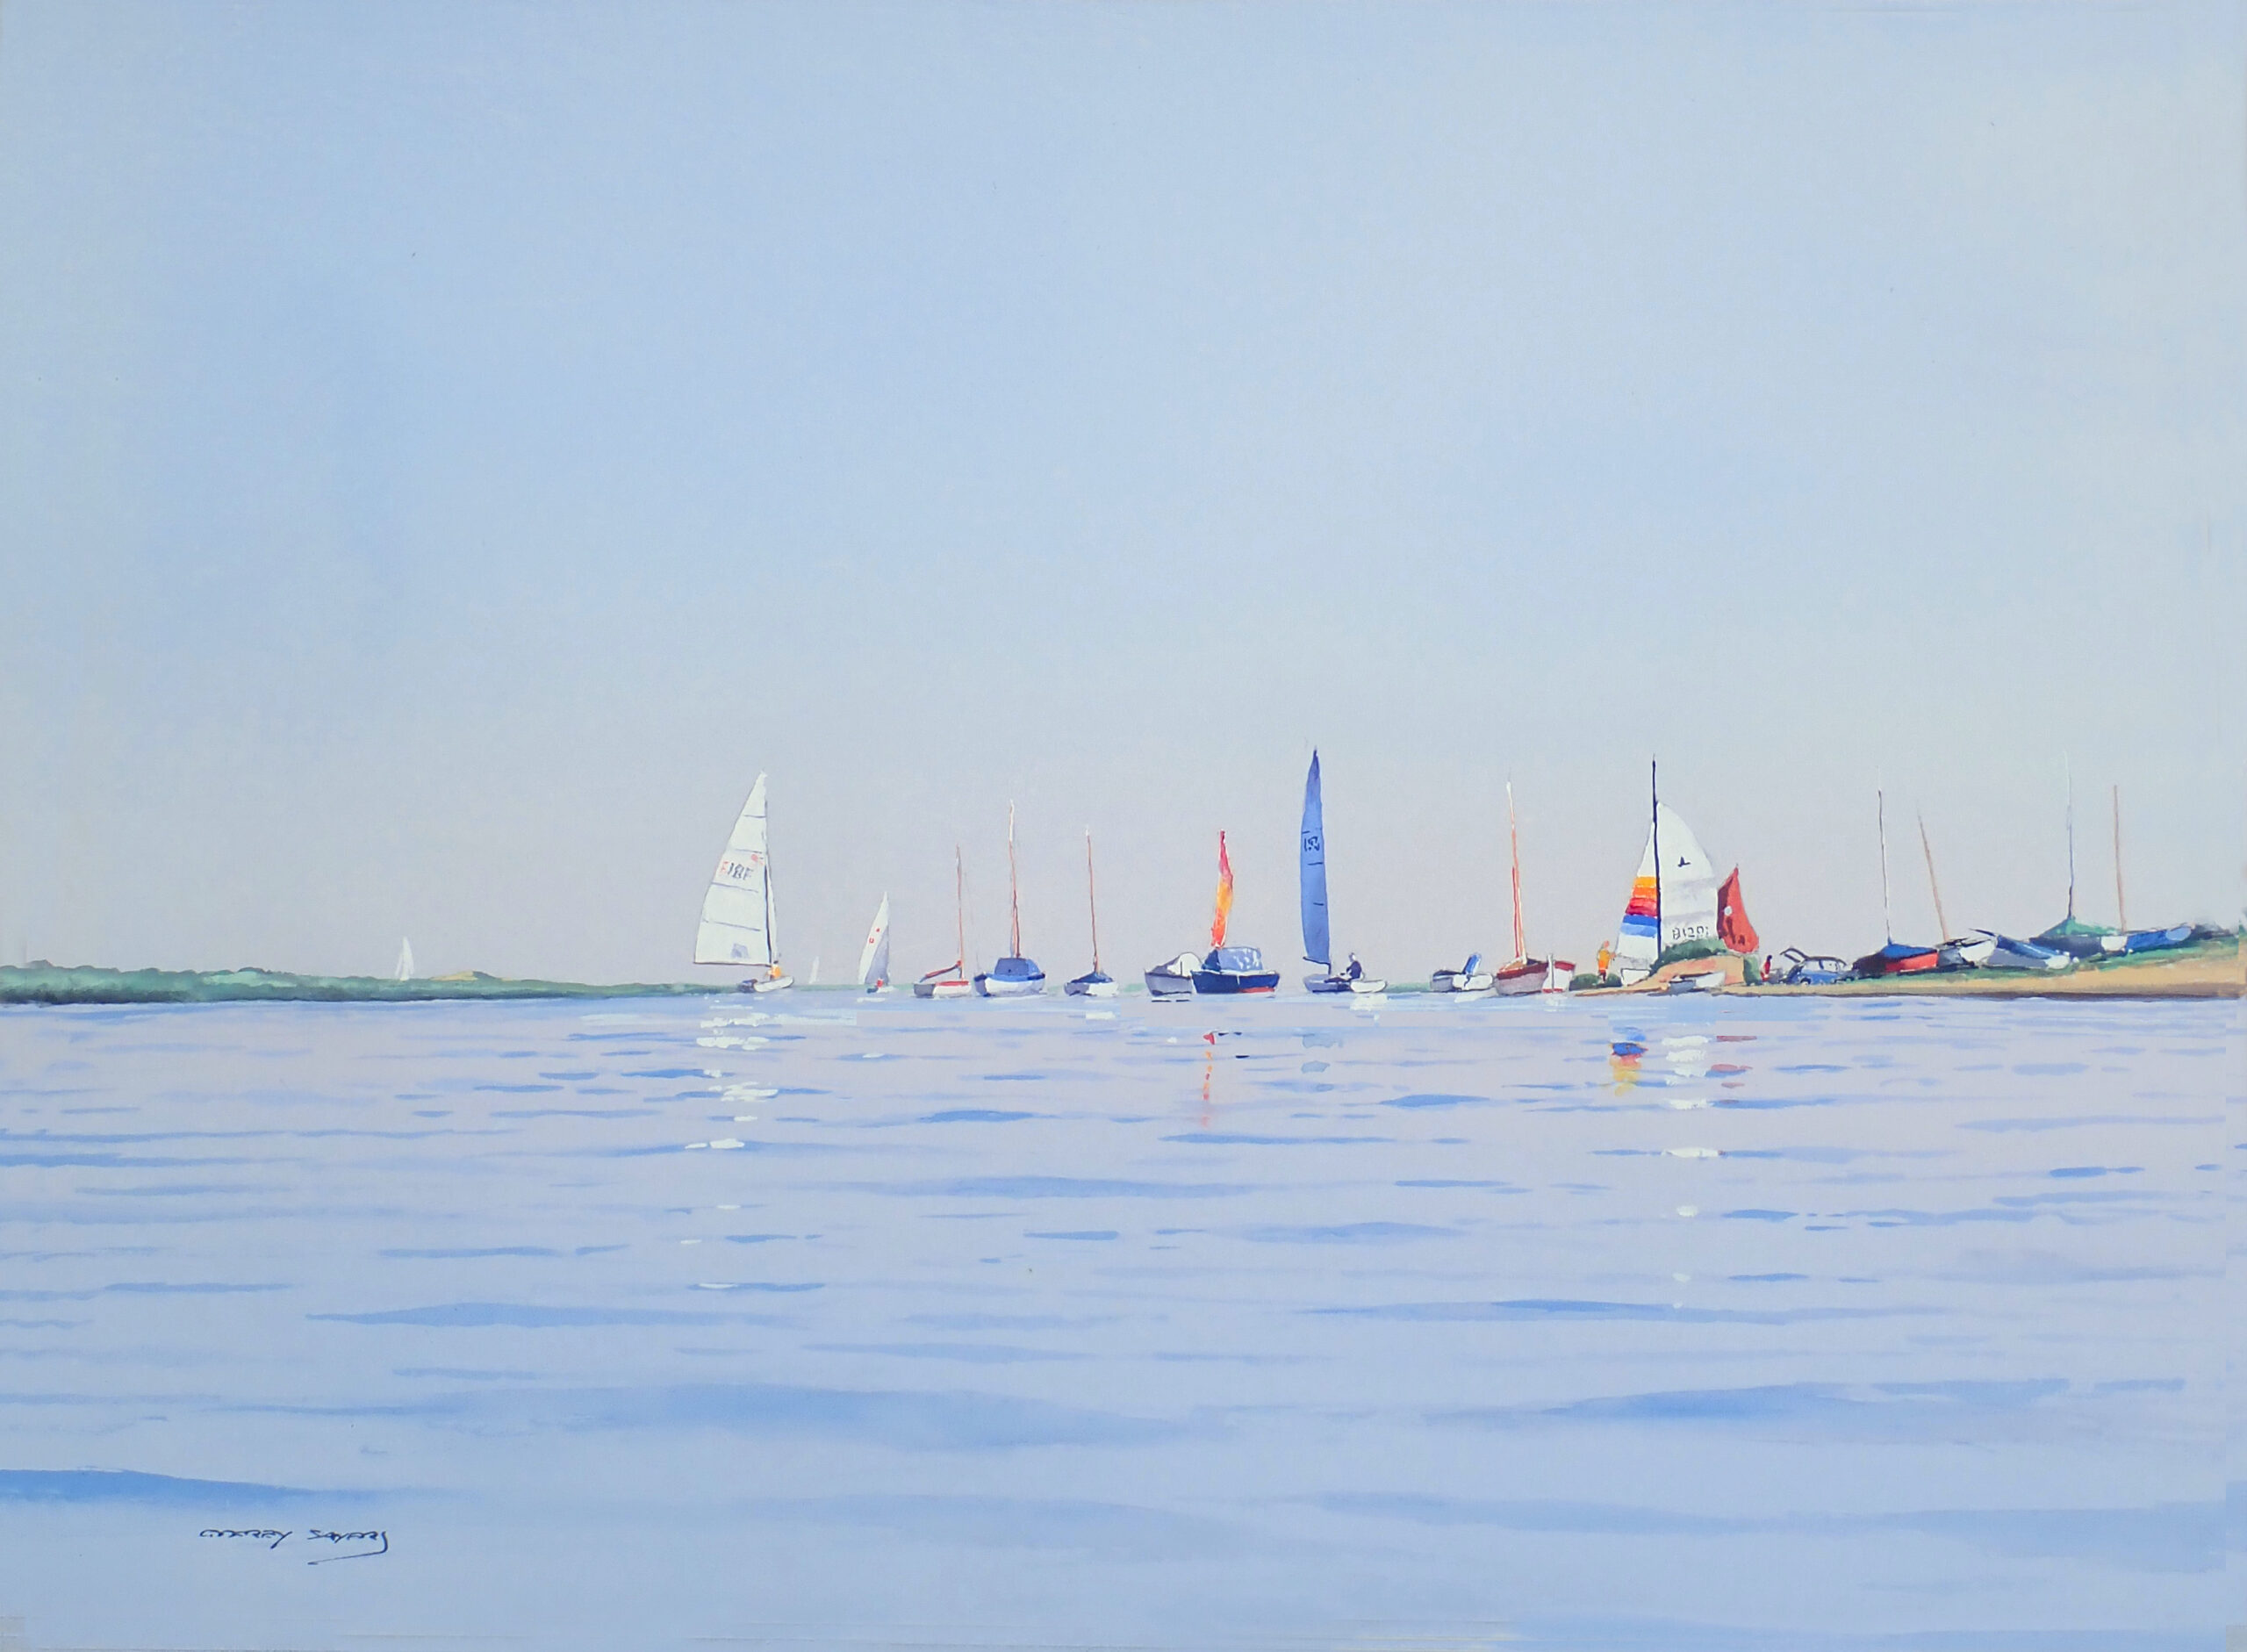 Godfrey Sayers Sails Norfolk